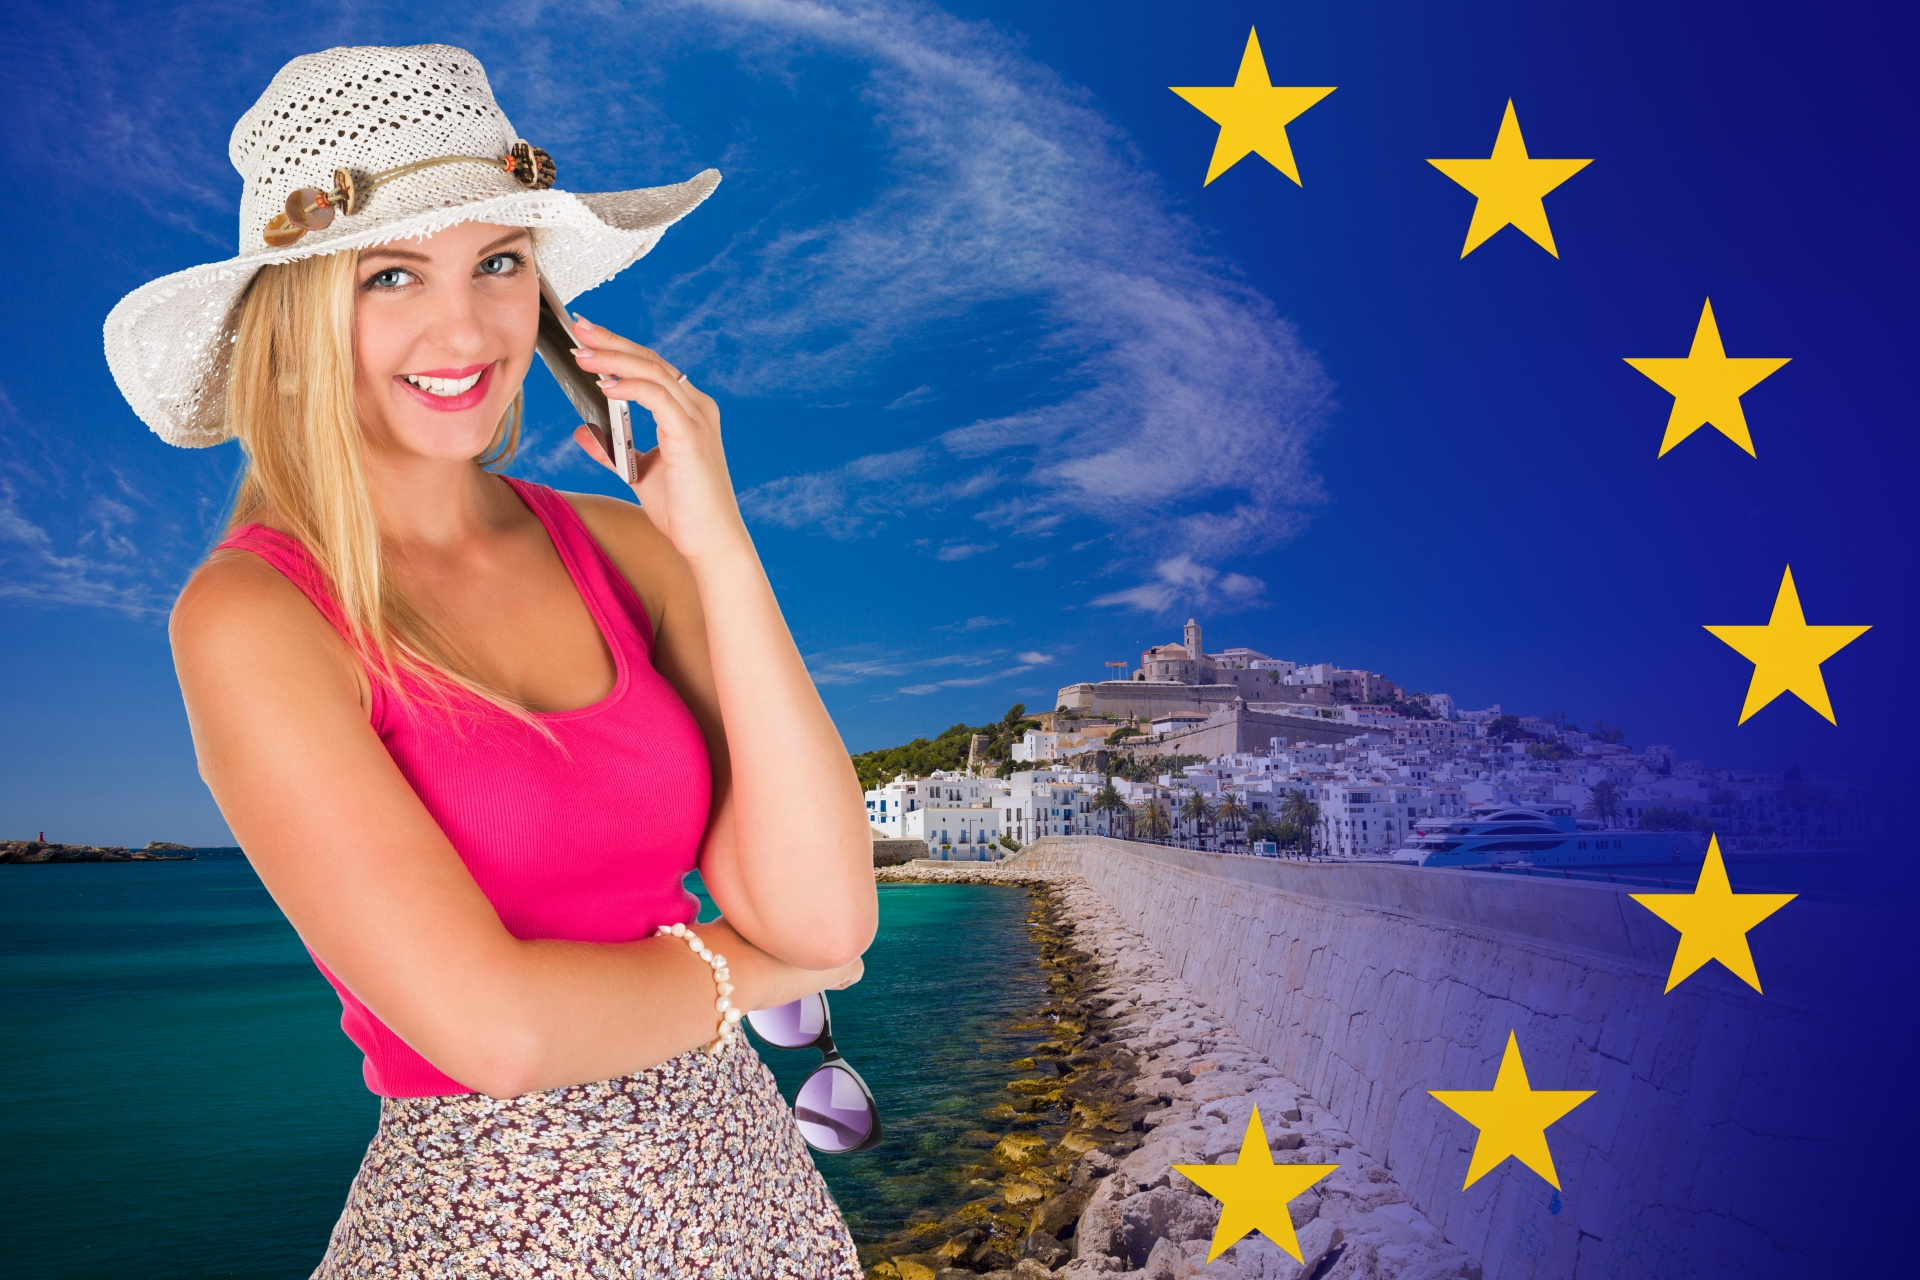 Fin frais roaming 15 juin 2017